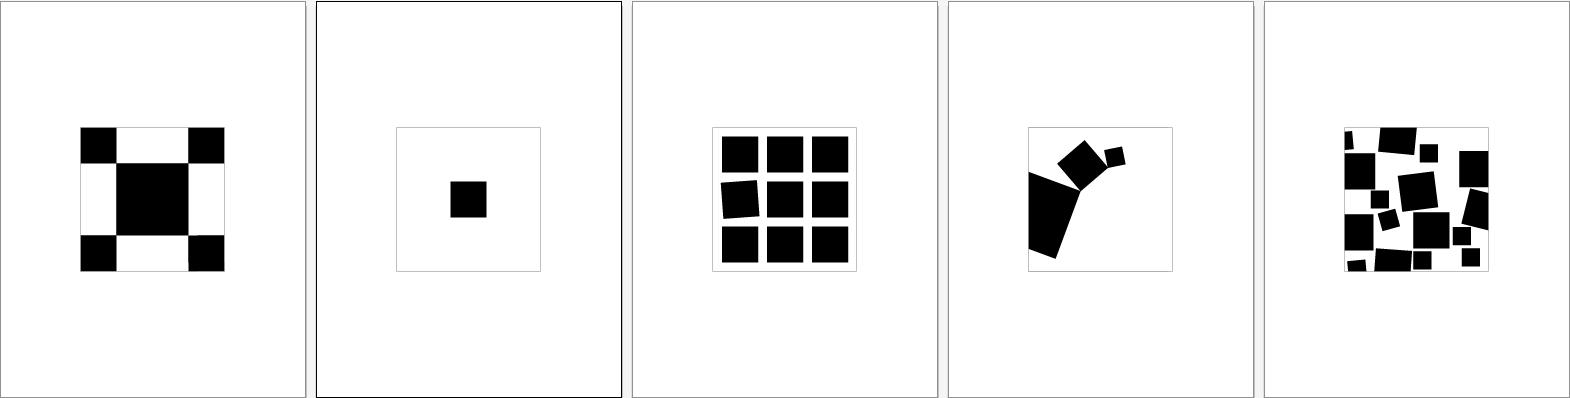 5 Illustrator generated images